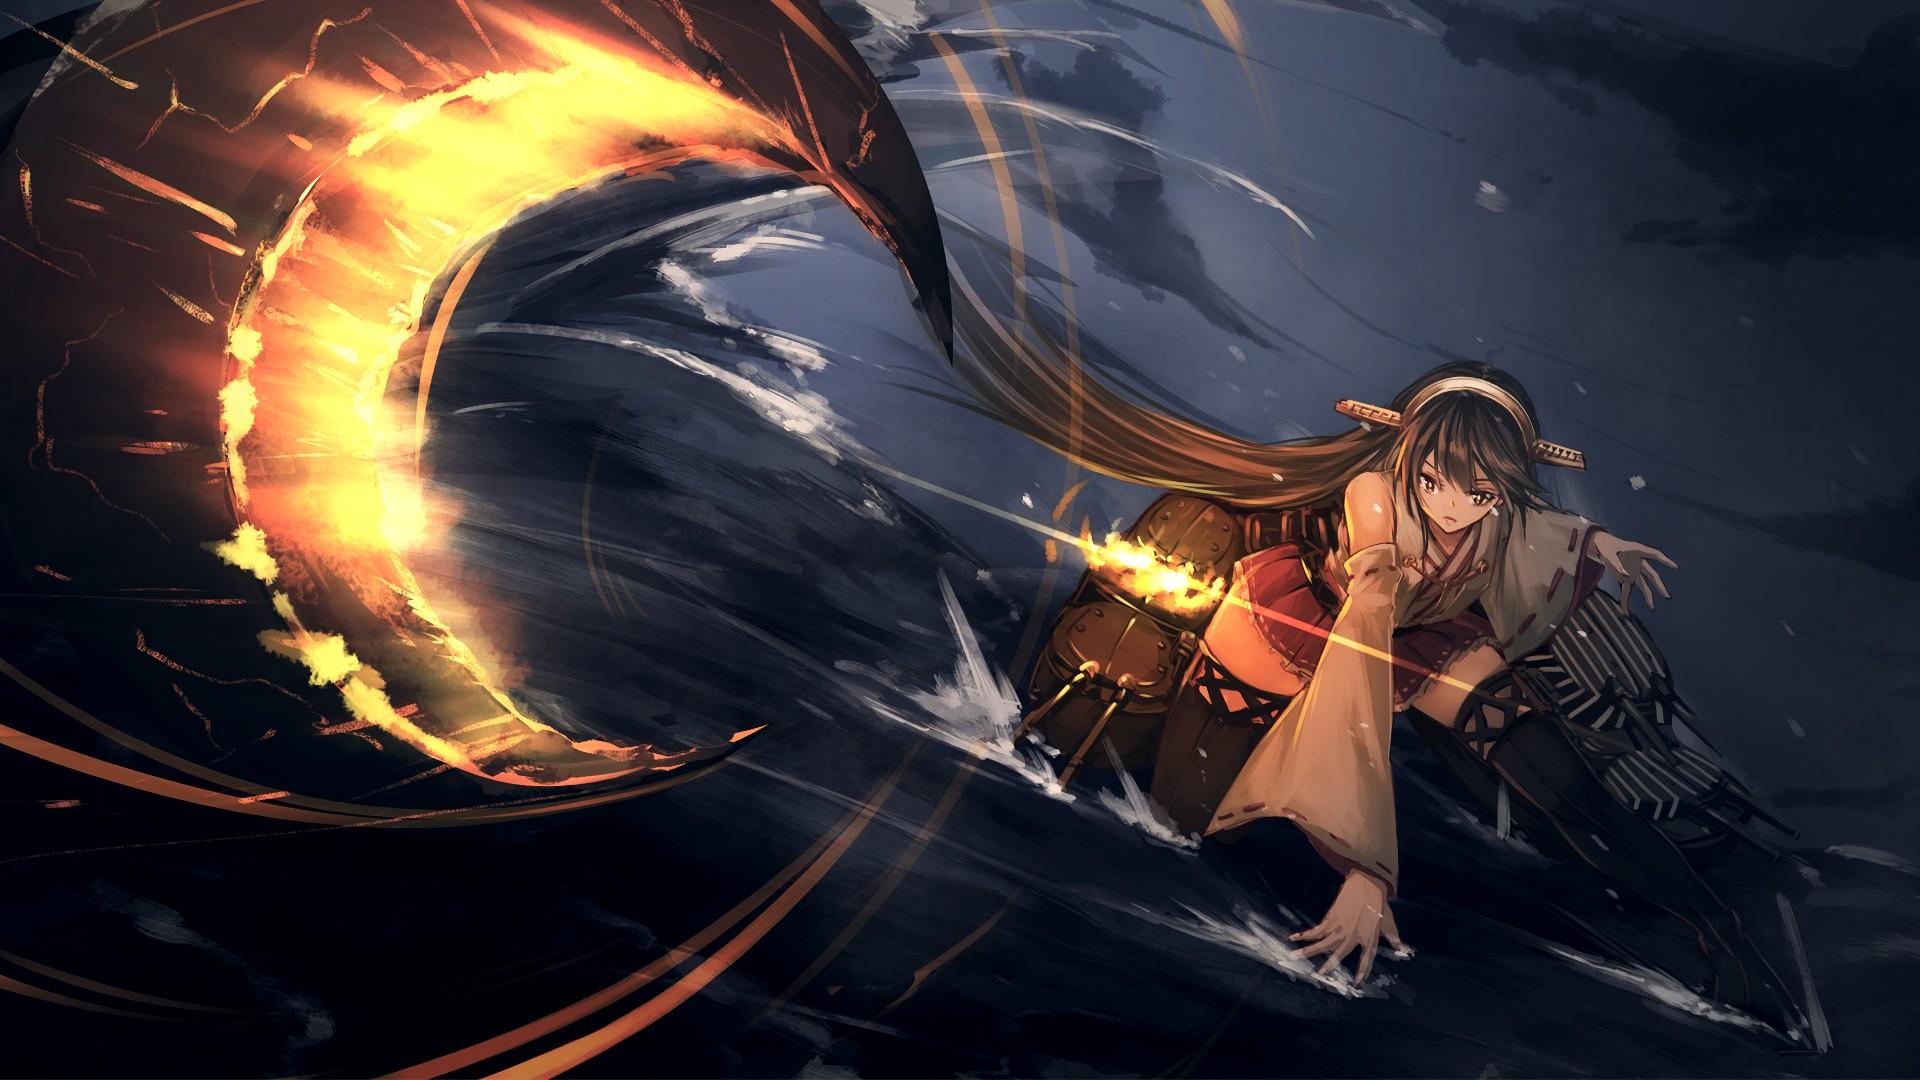 Wallpaper Haruna, kancolle, fight, anime girl